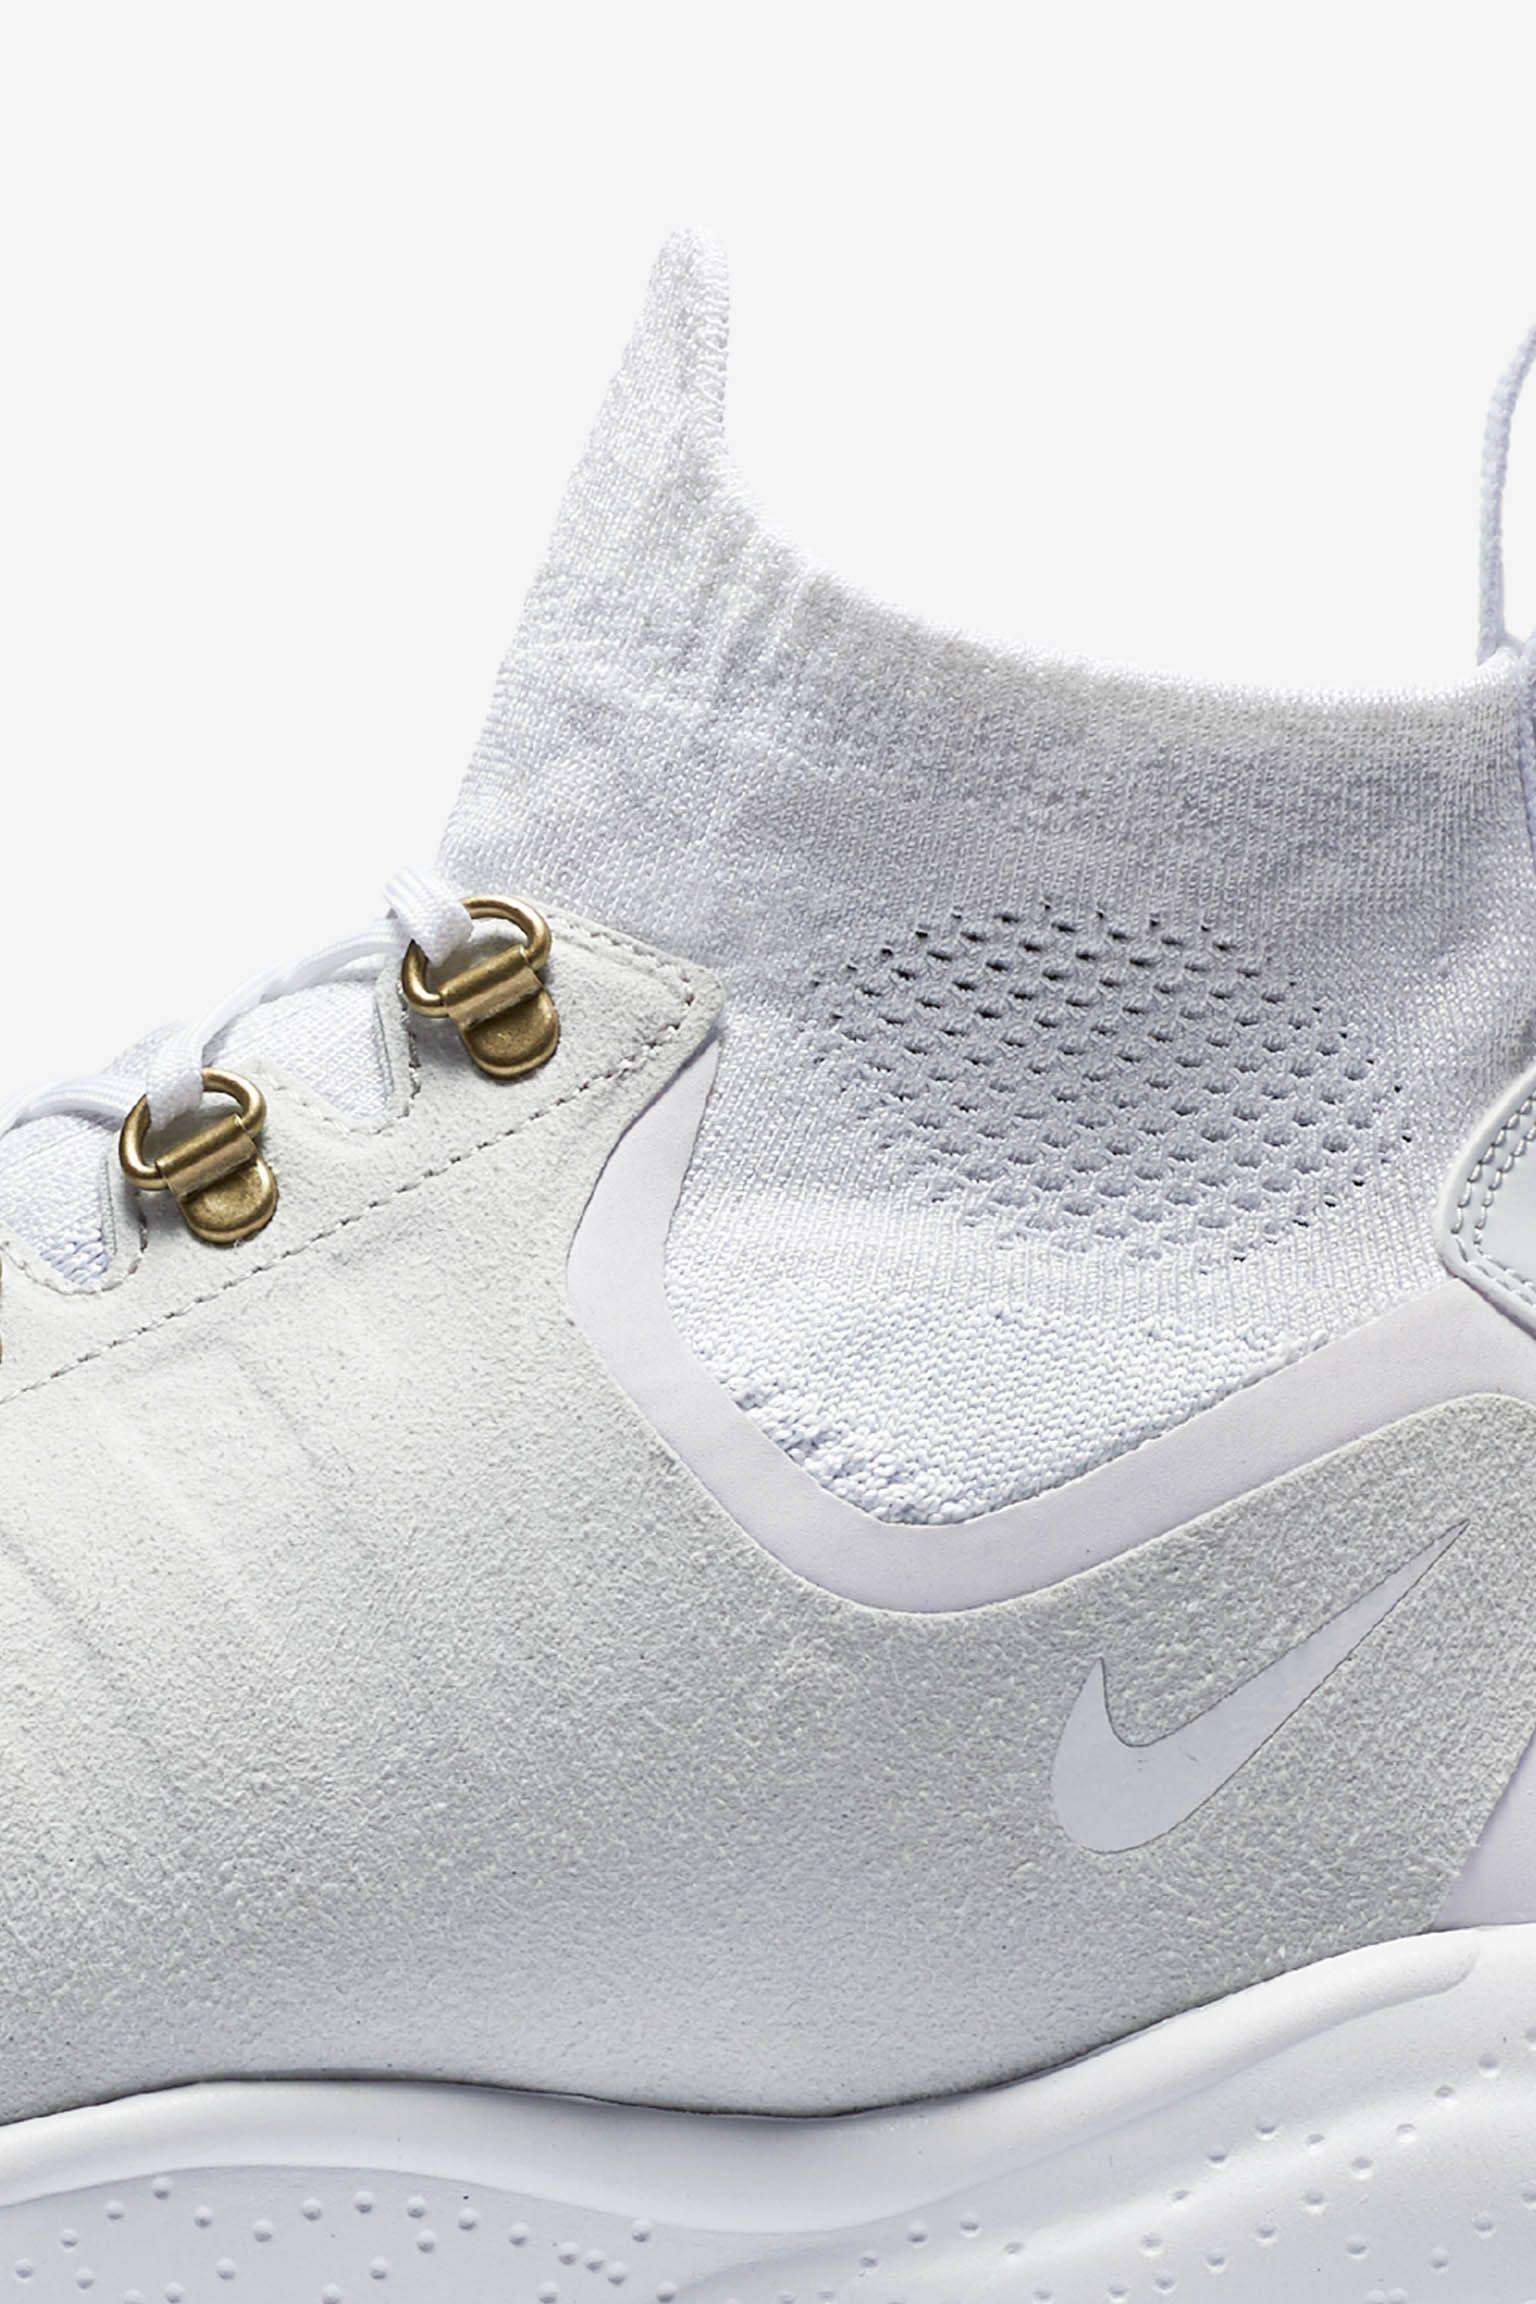 Nike Air Zoom Talaria Mid Flyknit 'White'